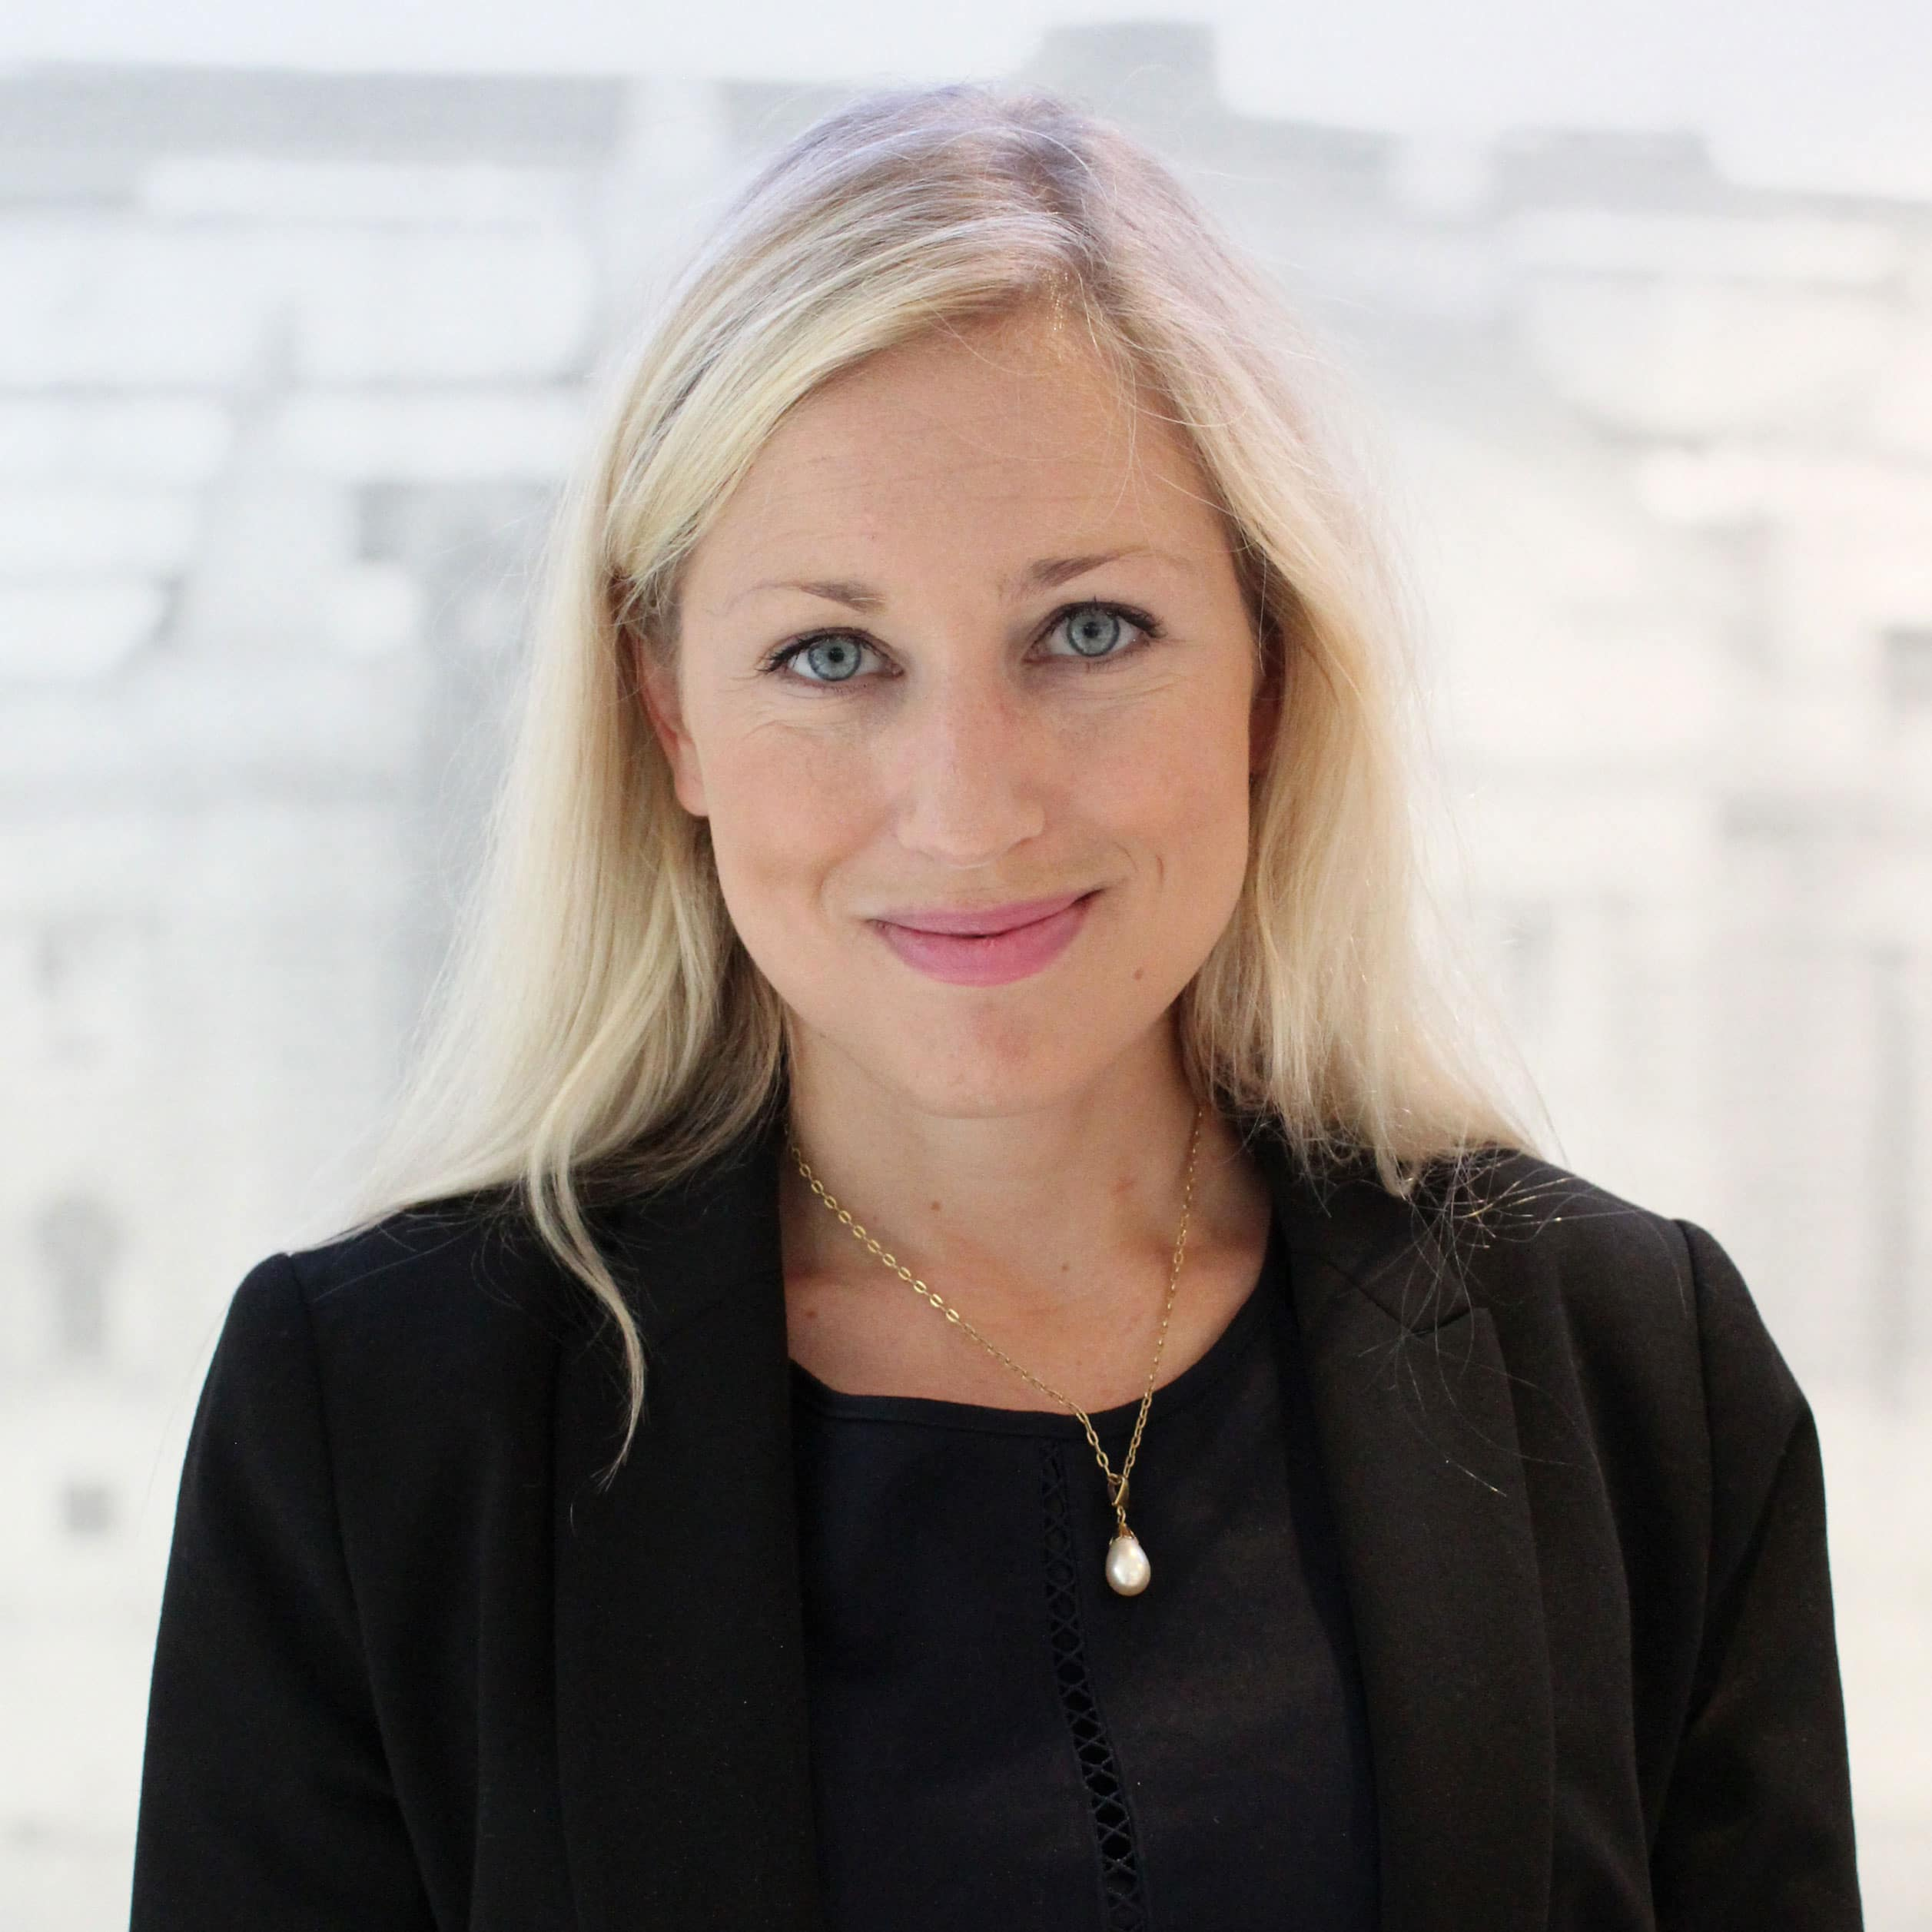 Linda Cardeberg